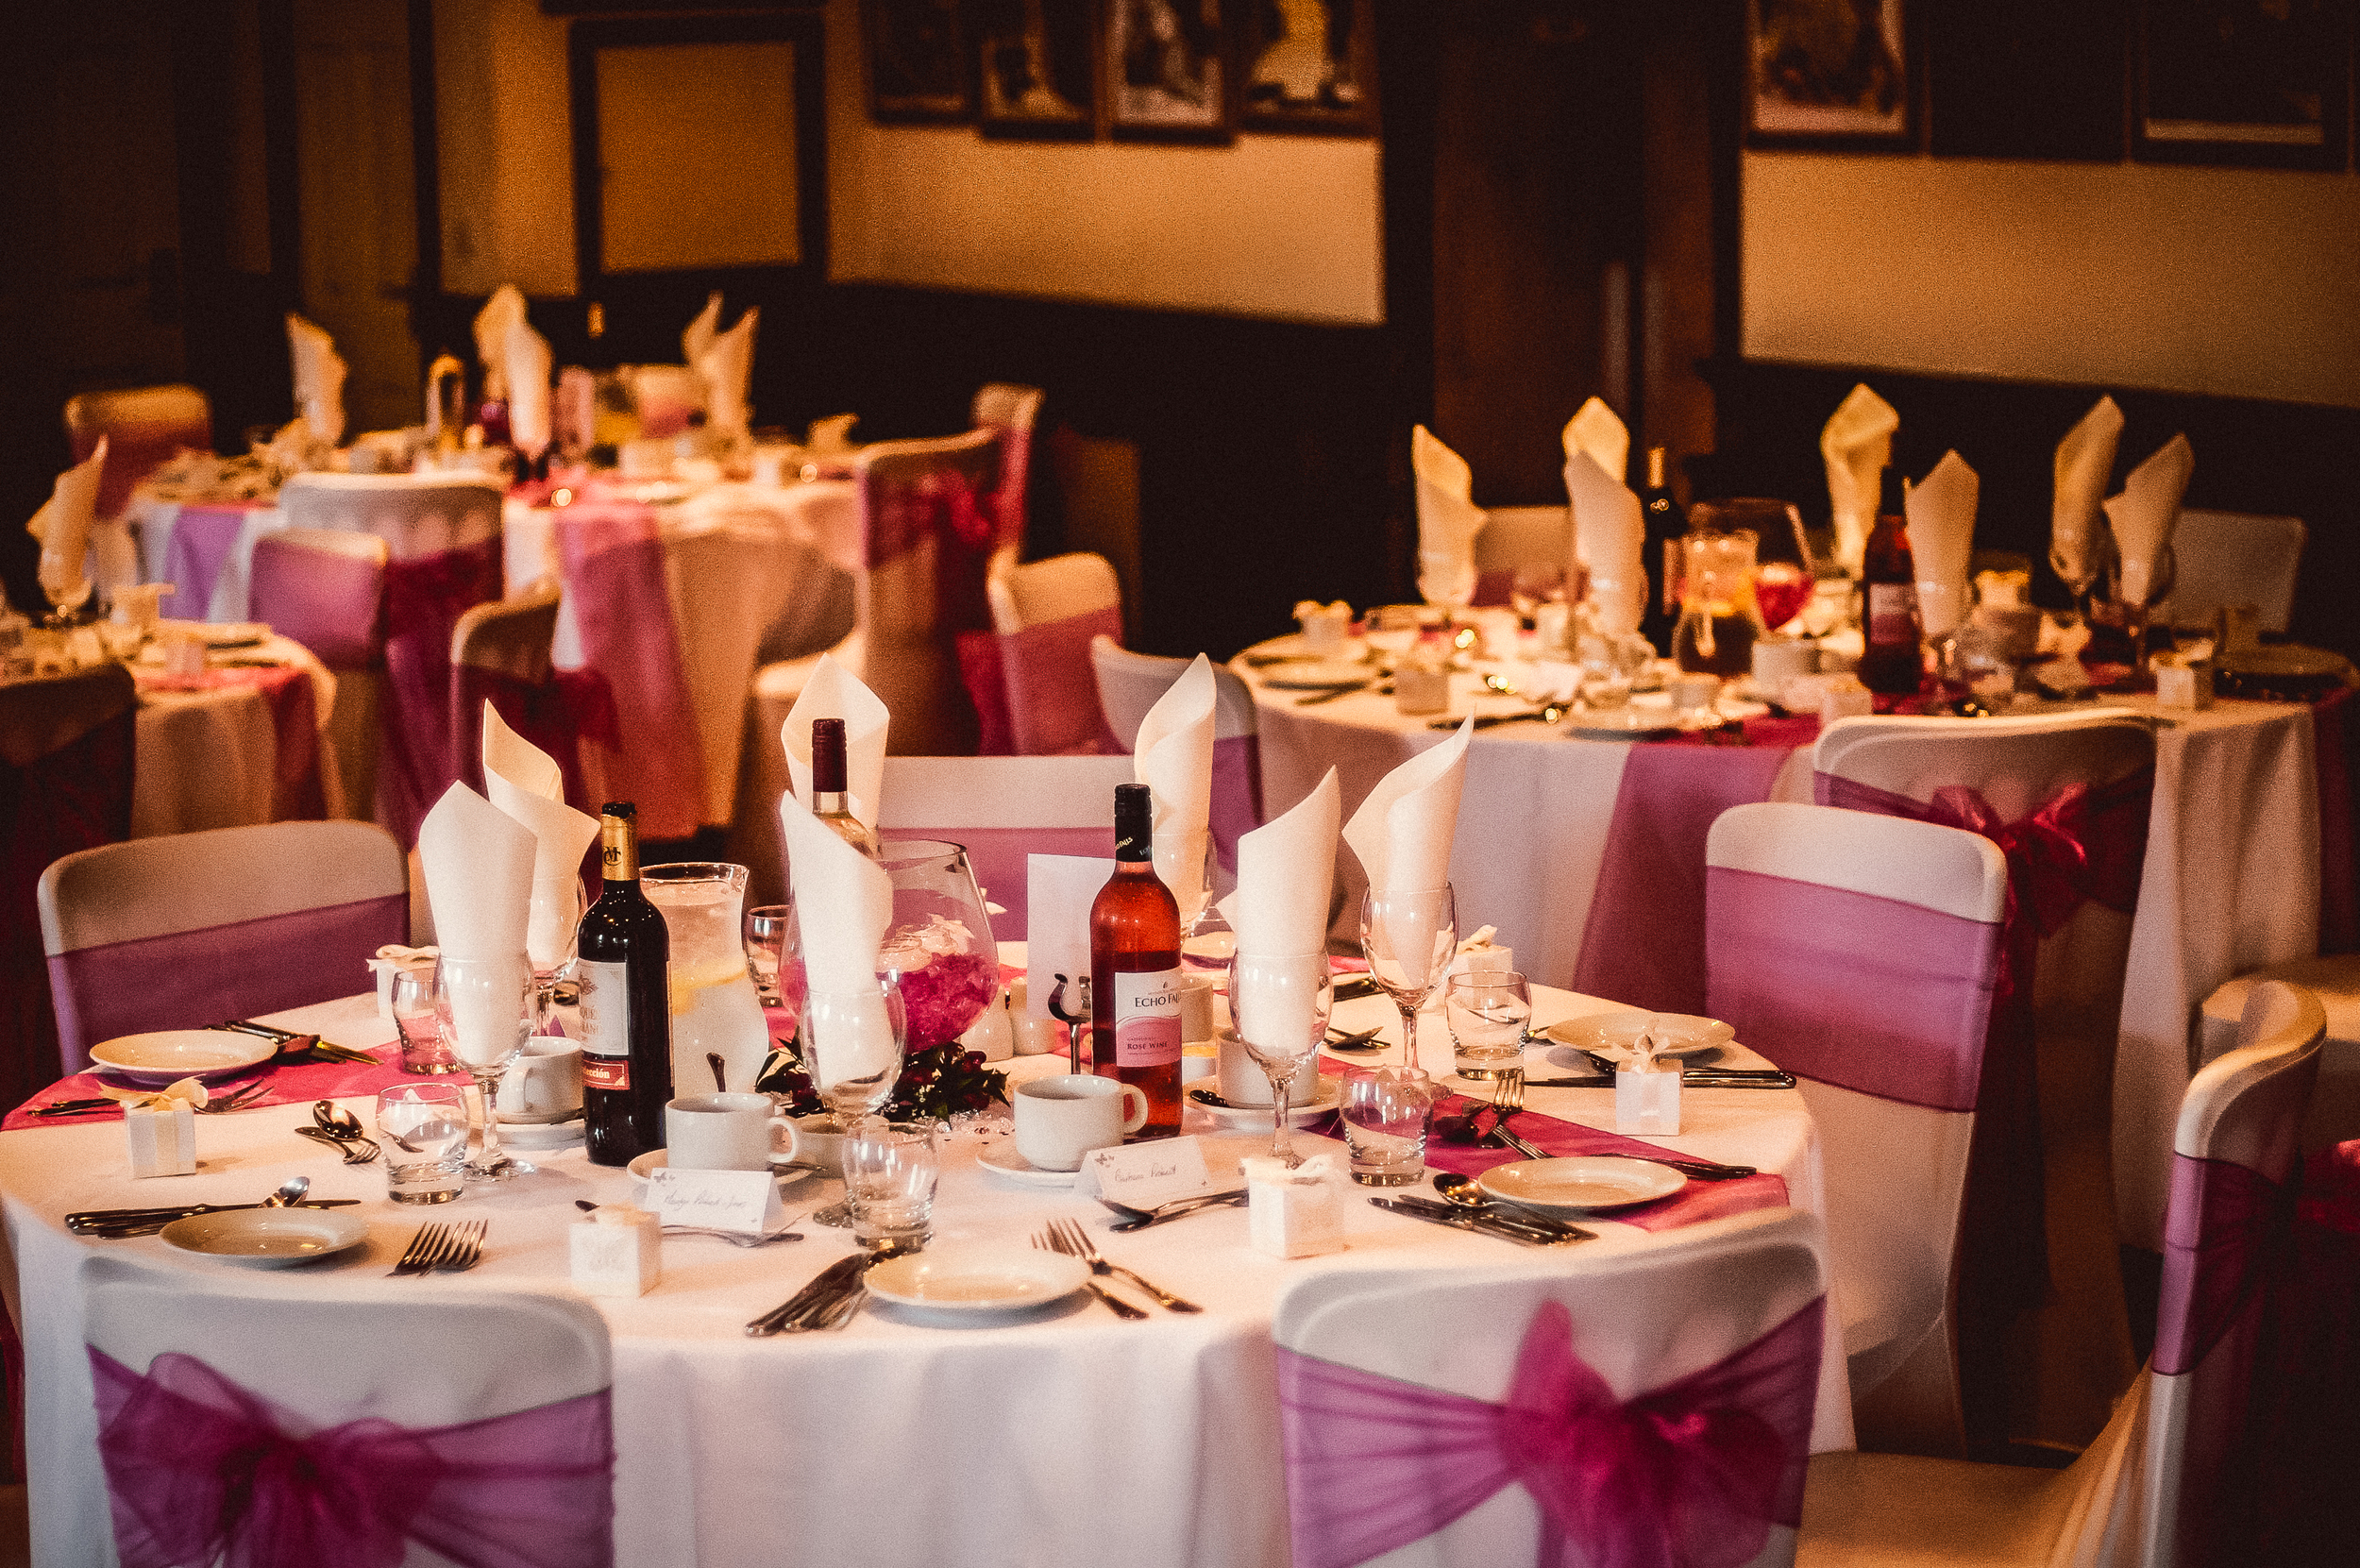 My first wedding.  Nikon D300 | 50mm | F1.4 - 1/1600th - iso1000